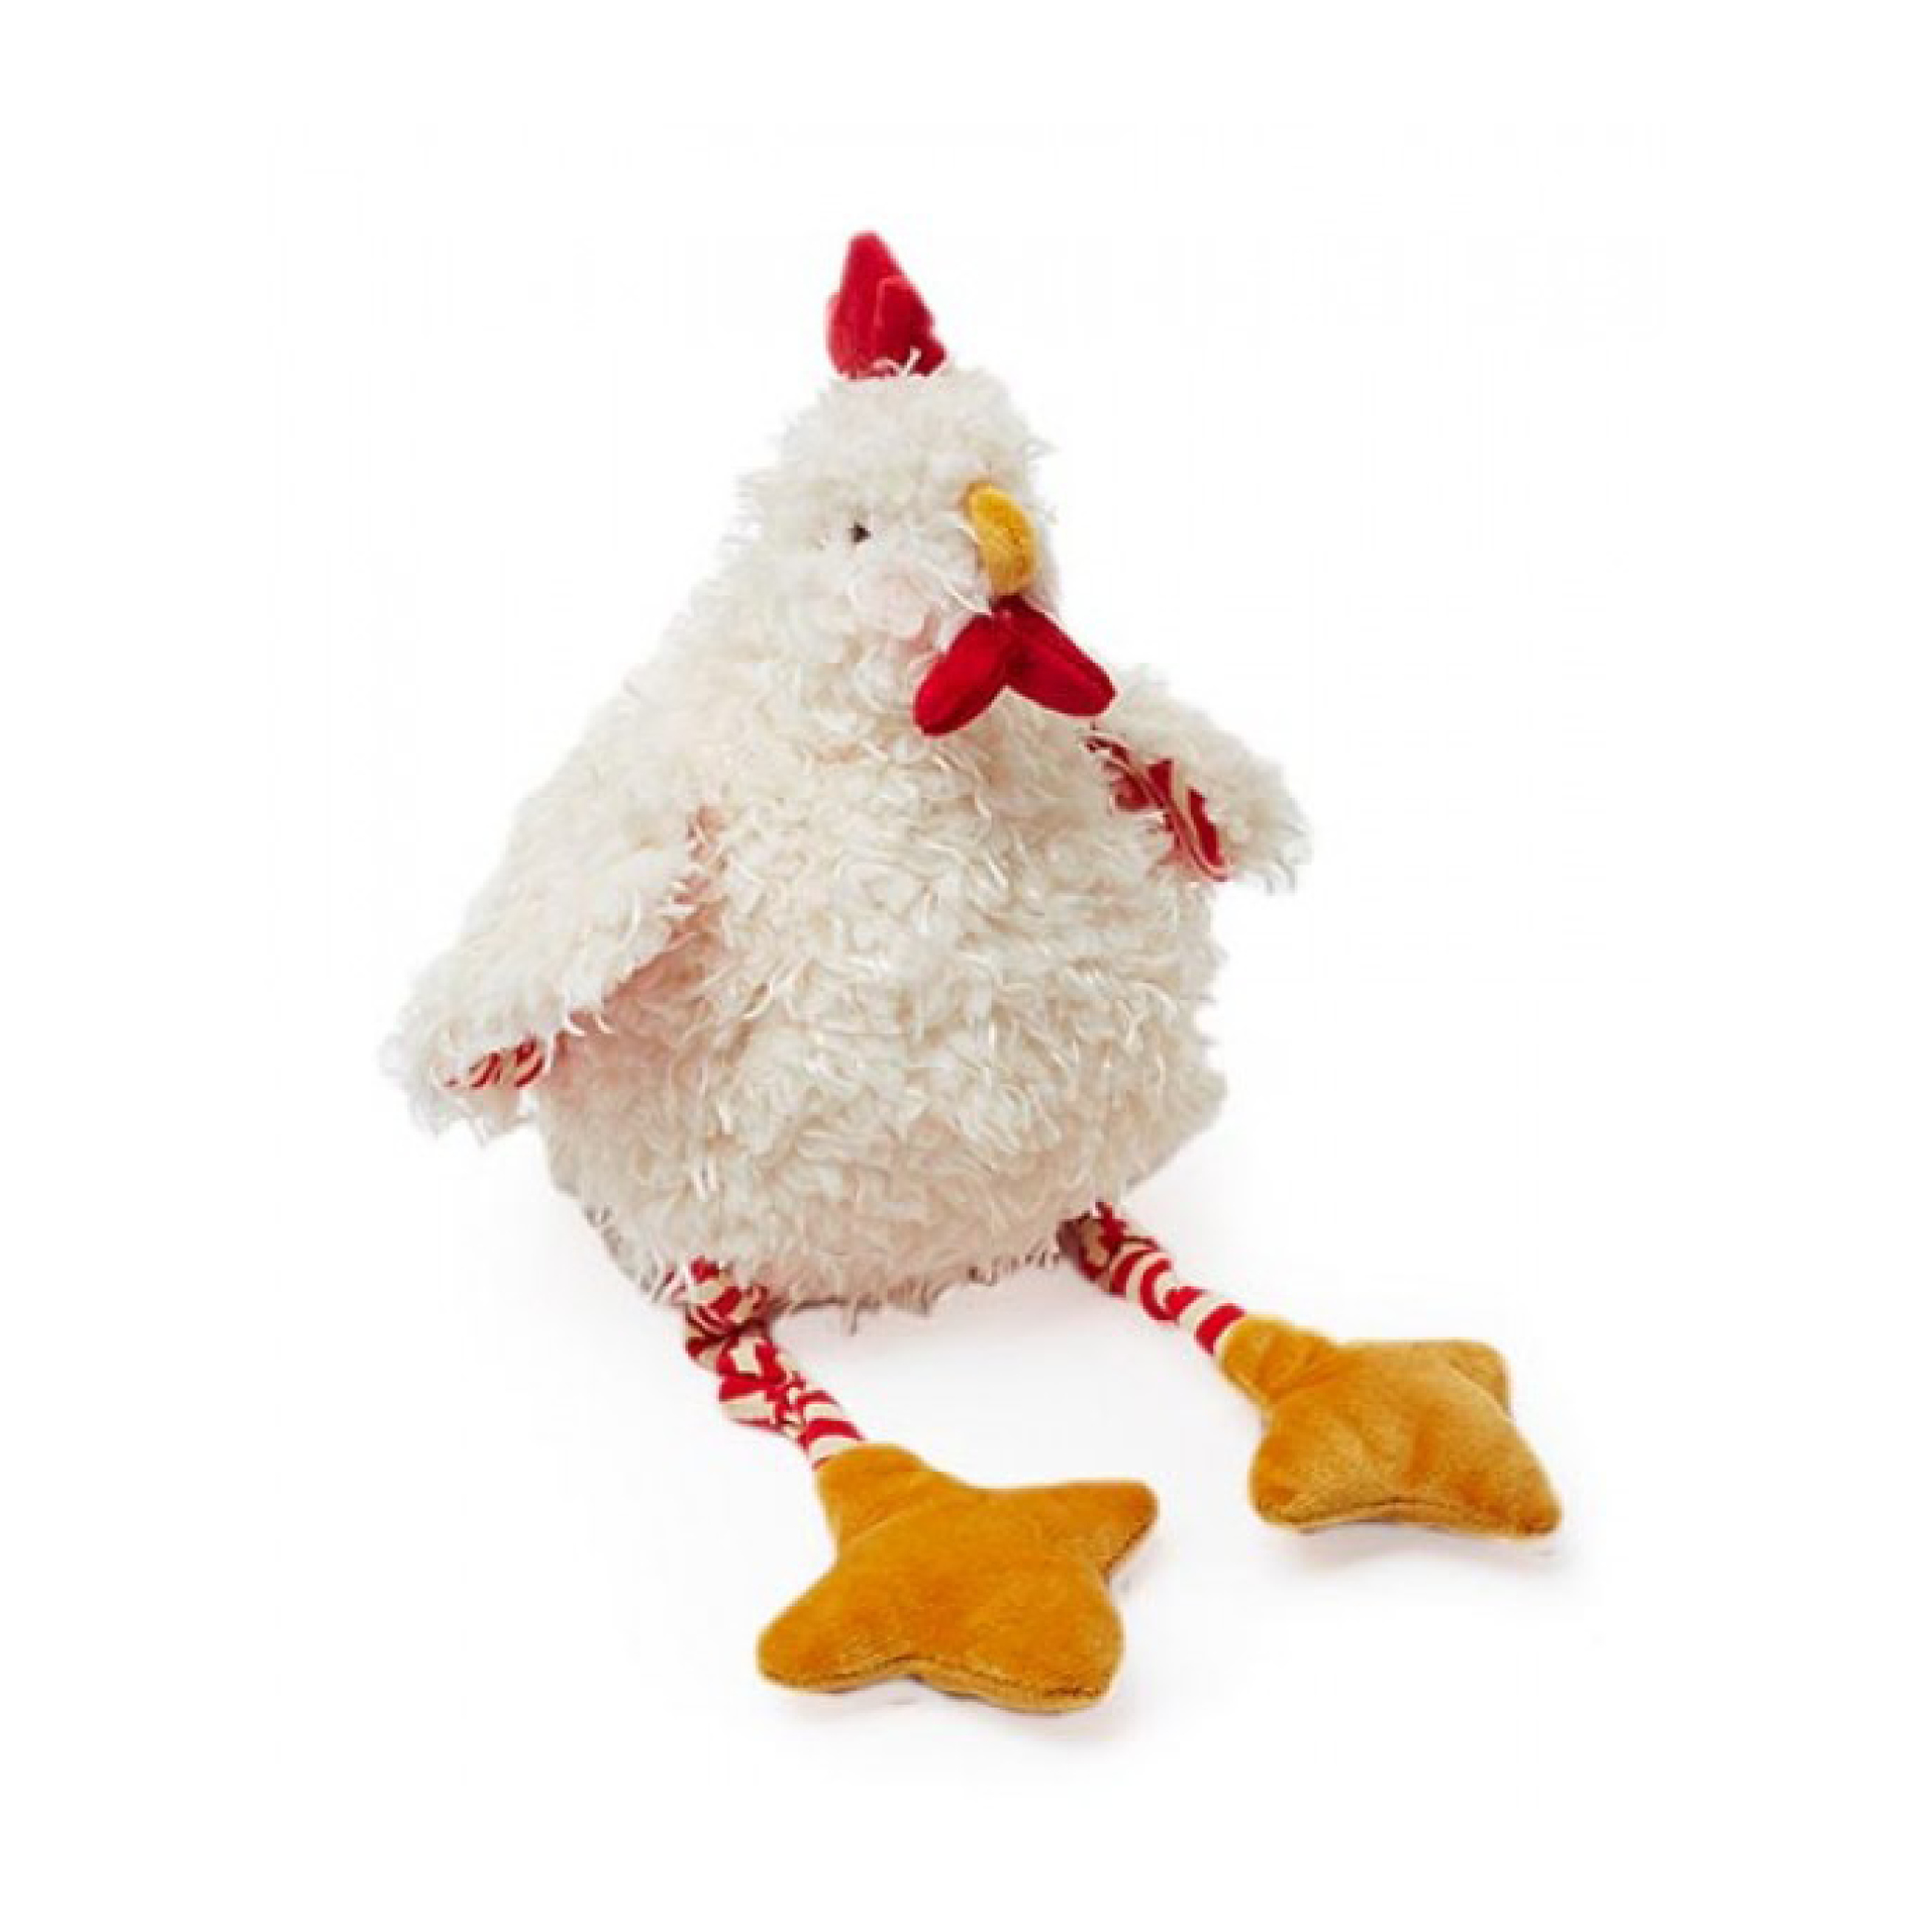 BBTB Stuffed Hen  $23.95   Wants 1 Has 0 Needs 1